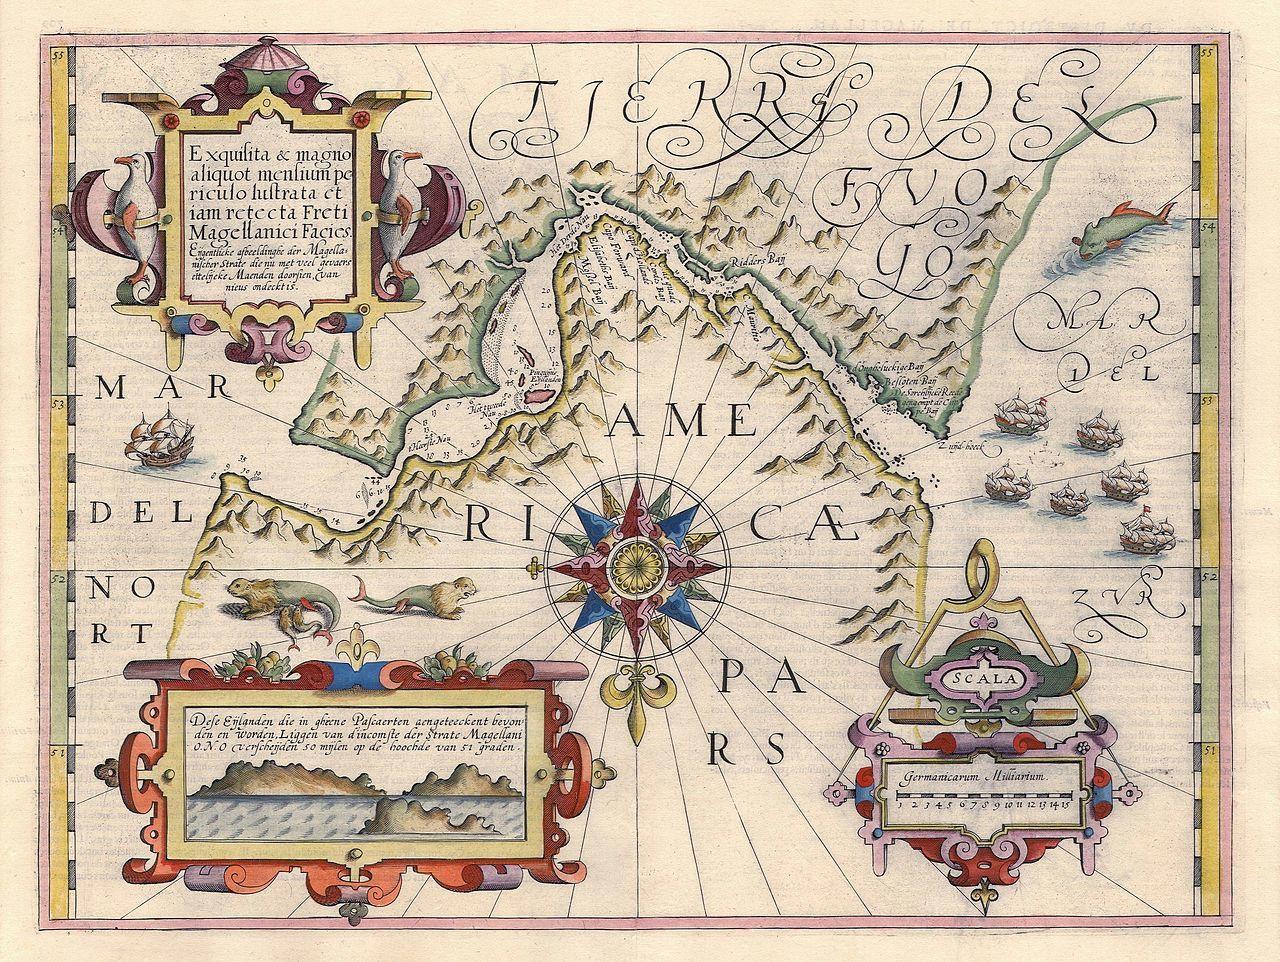 1280px-Strait_of_Magellan_by_Jodocus_Hondius